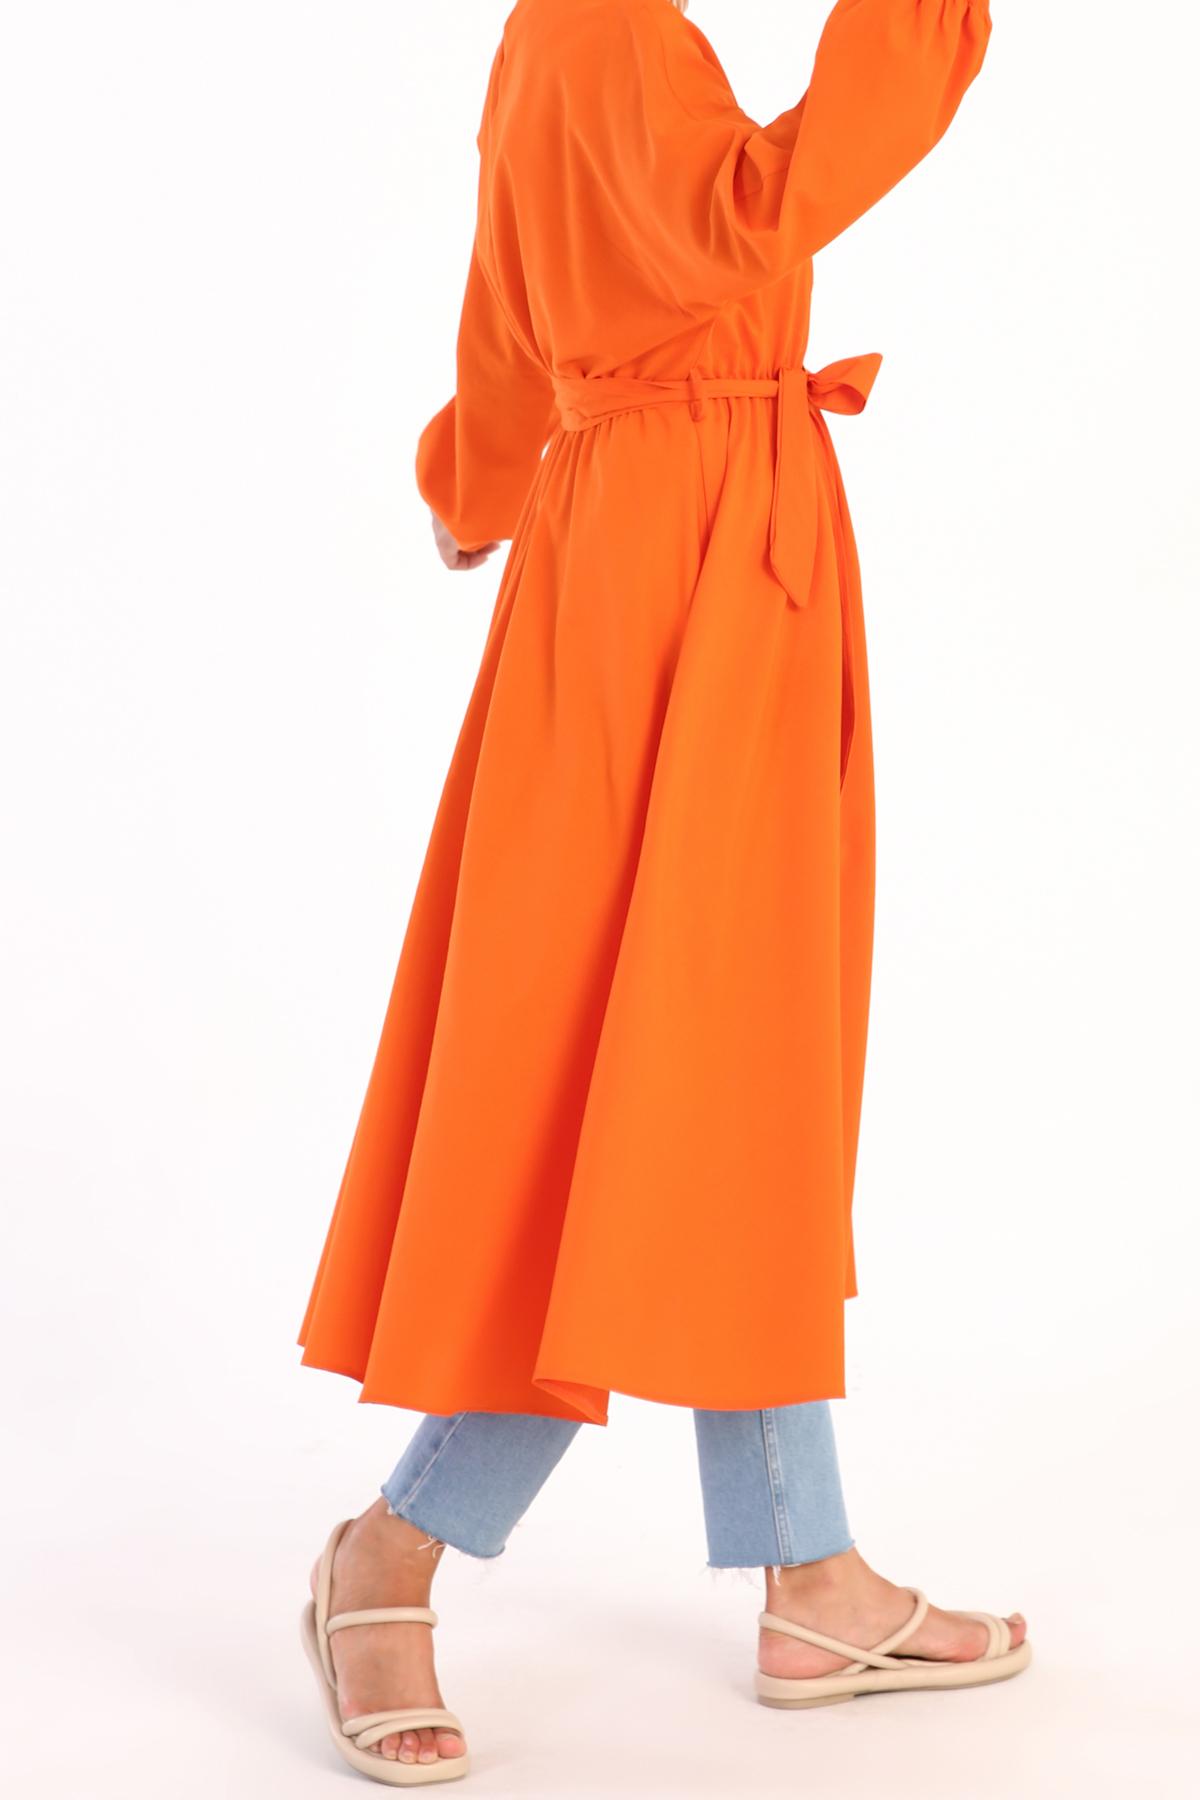 Yarasa Kol Pamuklu Uzun Tunik